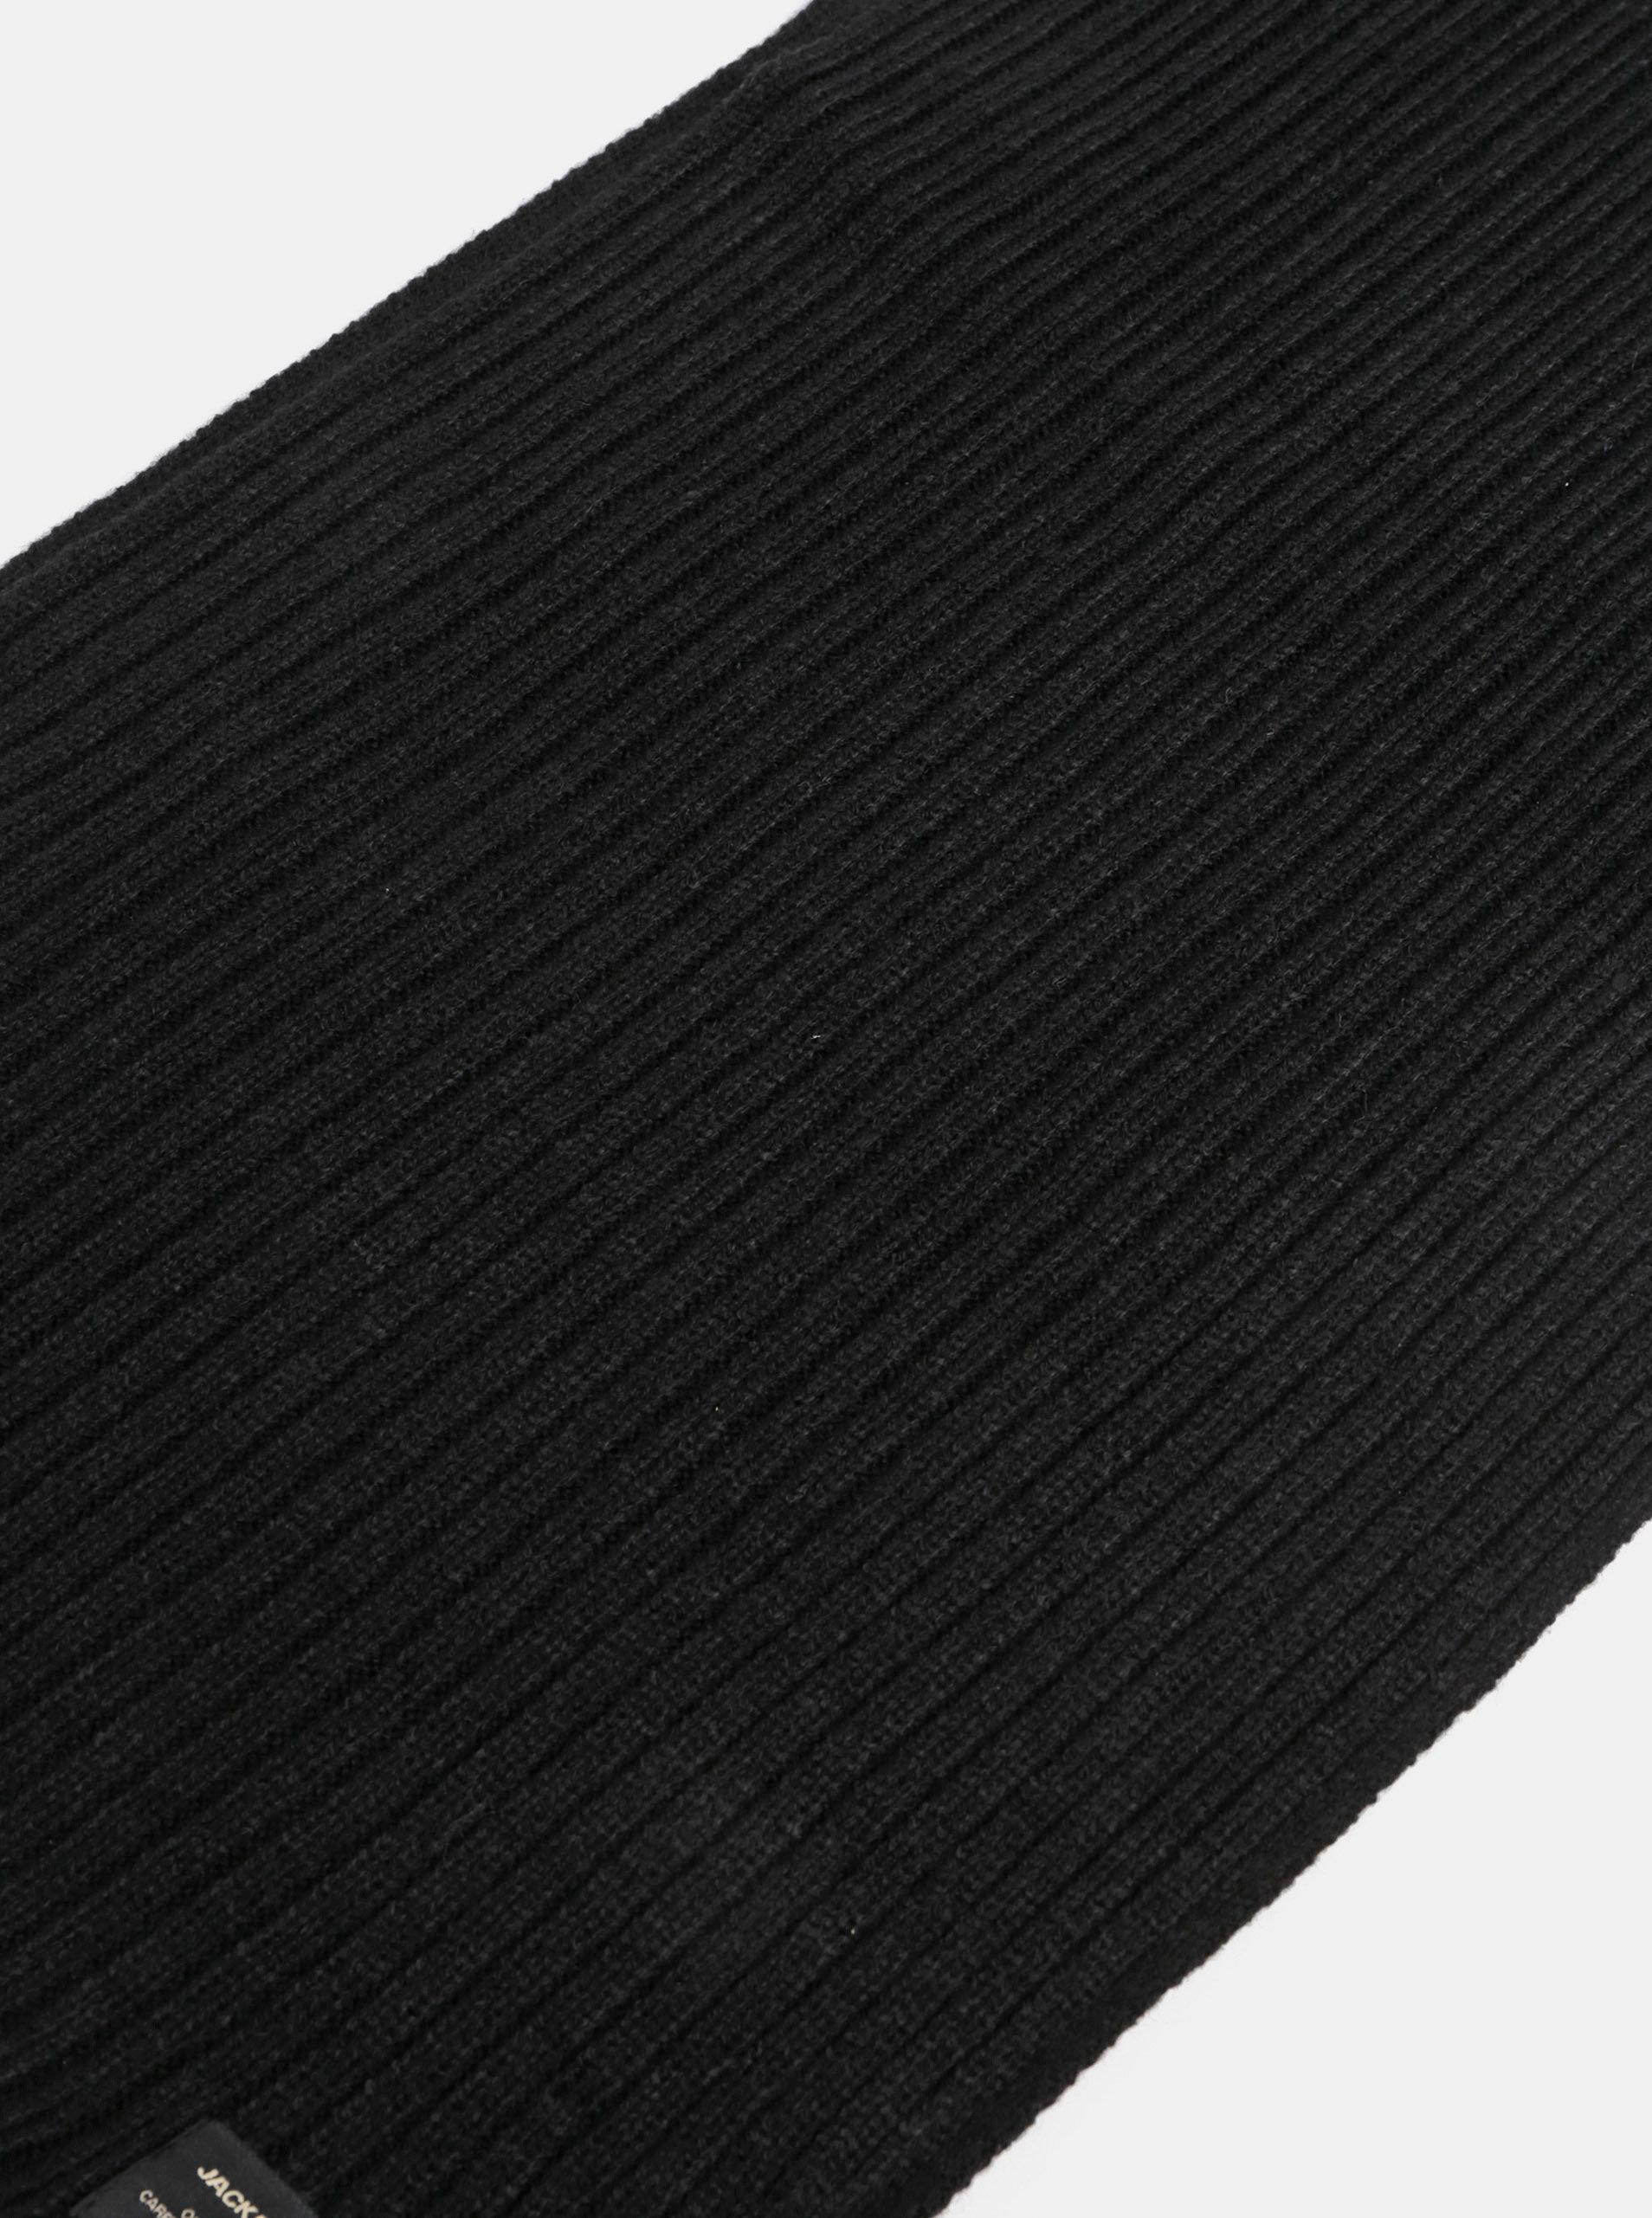 Černá pletená dutá šála Jack   Jones Tube ... 3c8c34071b